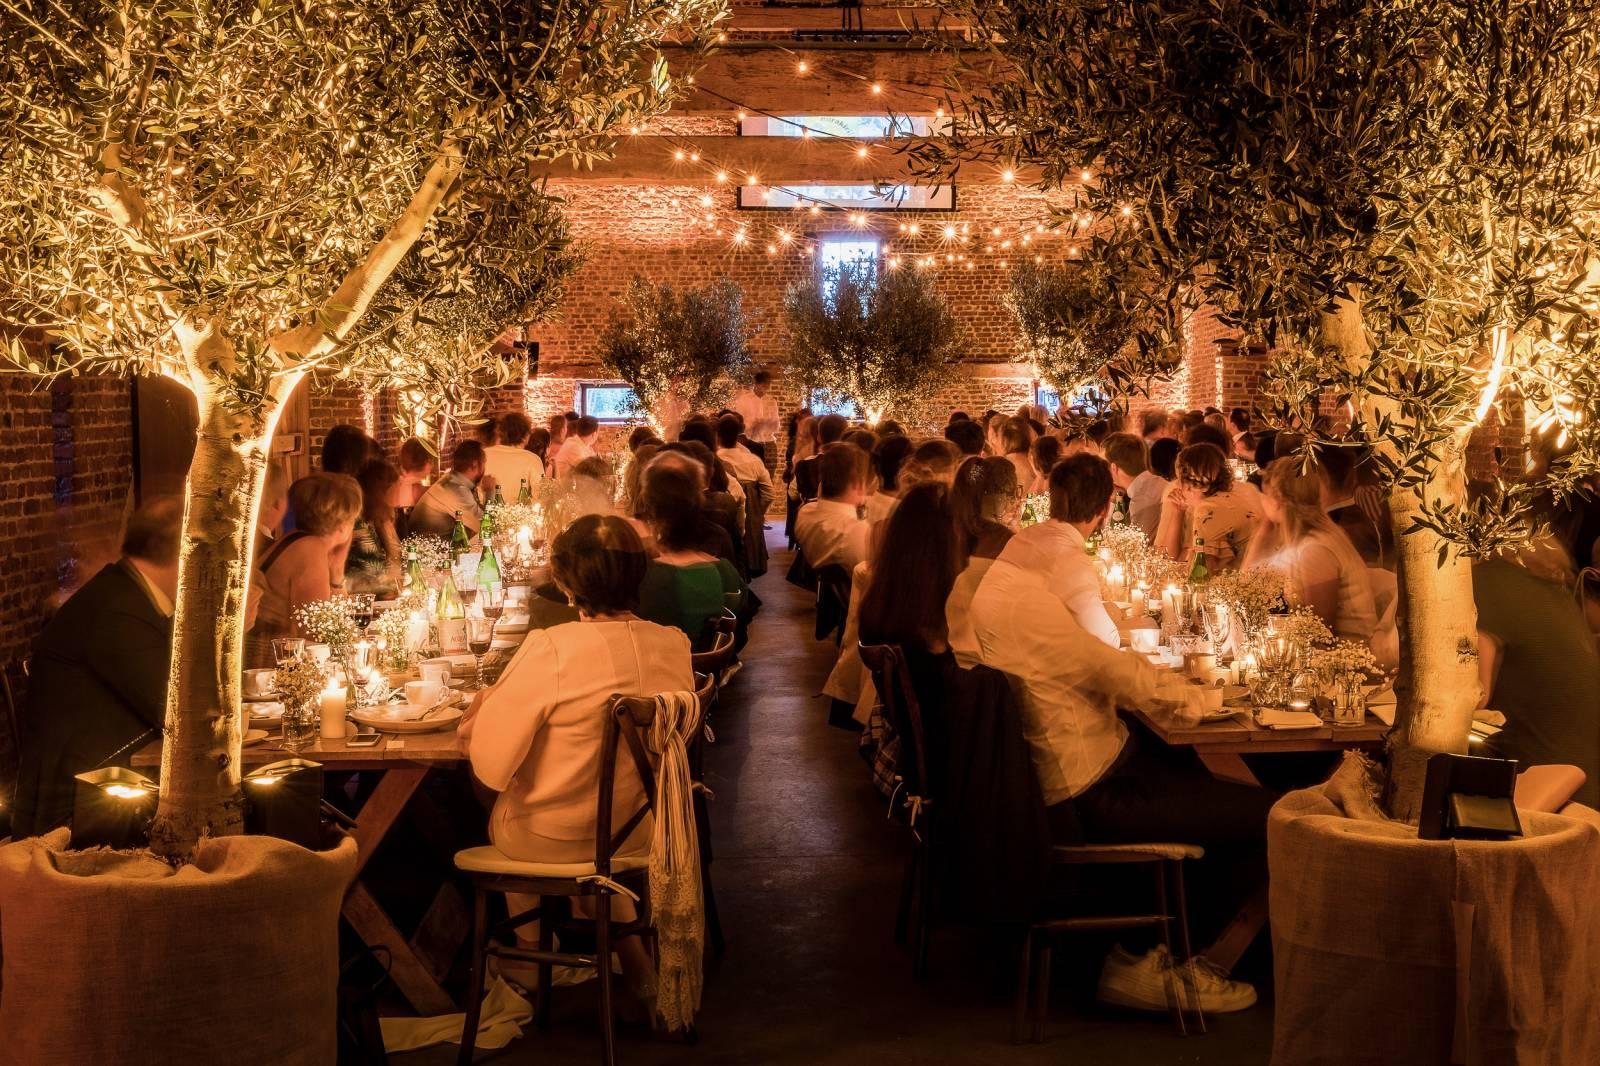 John & Jane - Licht&Geluid - Fotograaf Jurgen_de_Witte - House of Weddings - 5